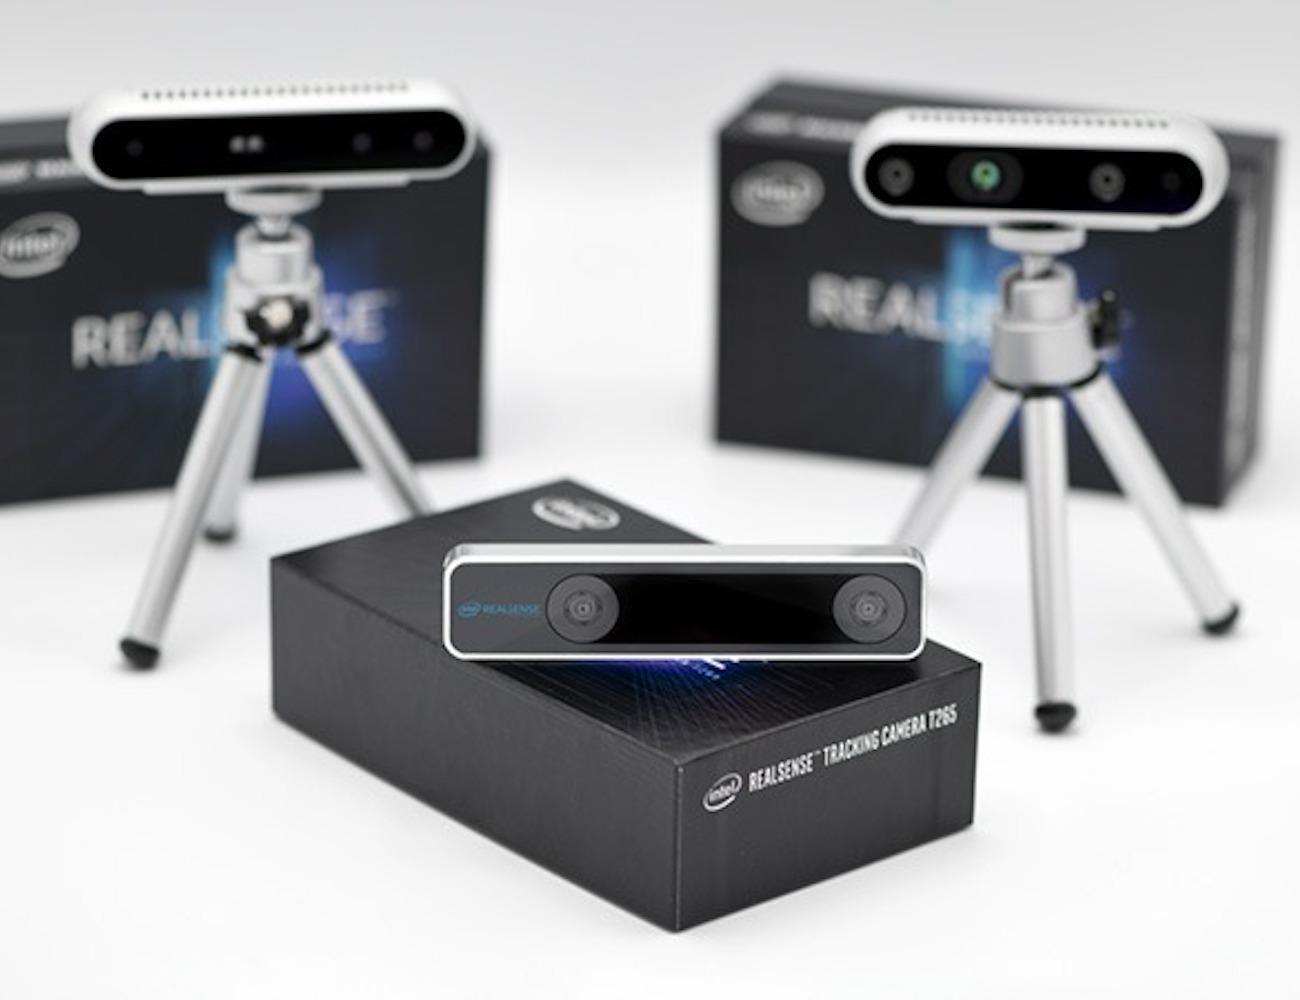 Intel T265 RealSense Tracking Camera